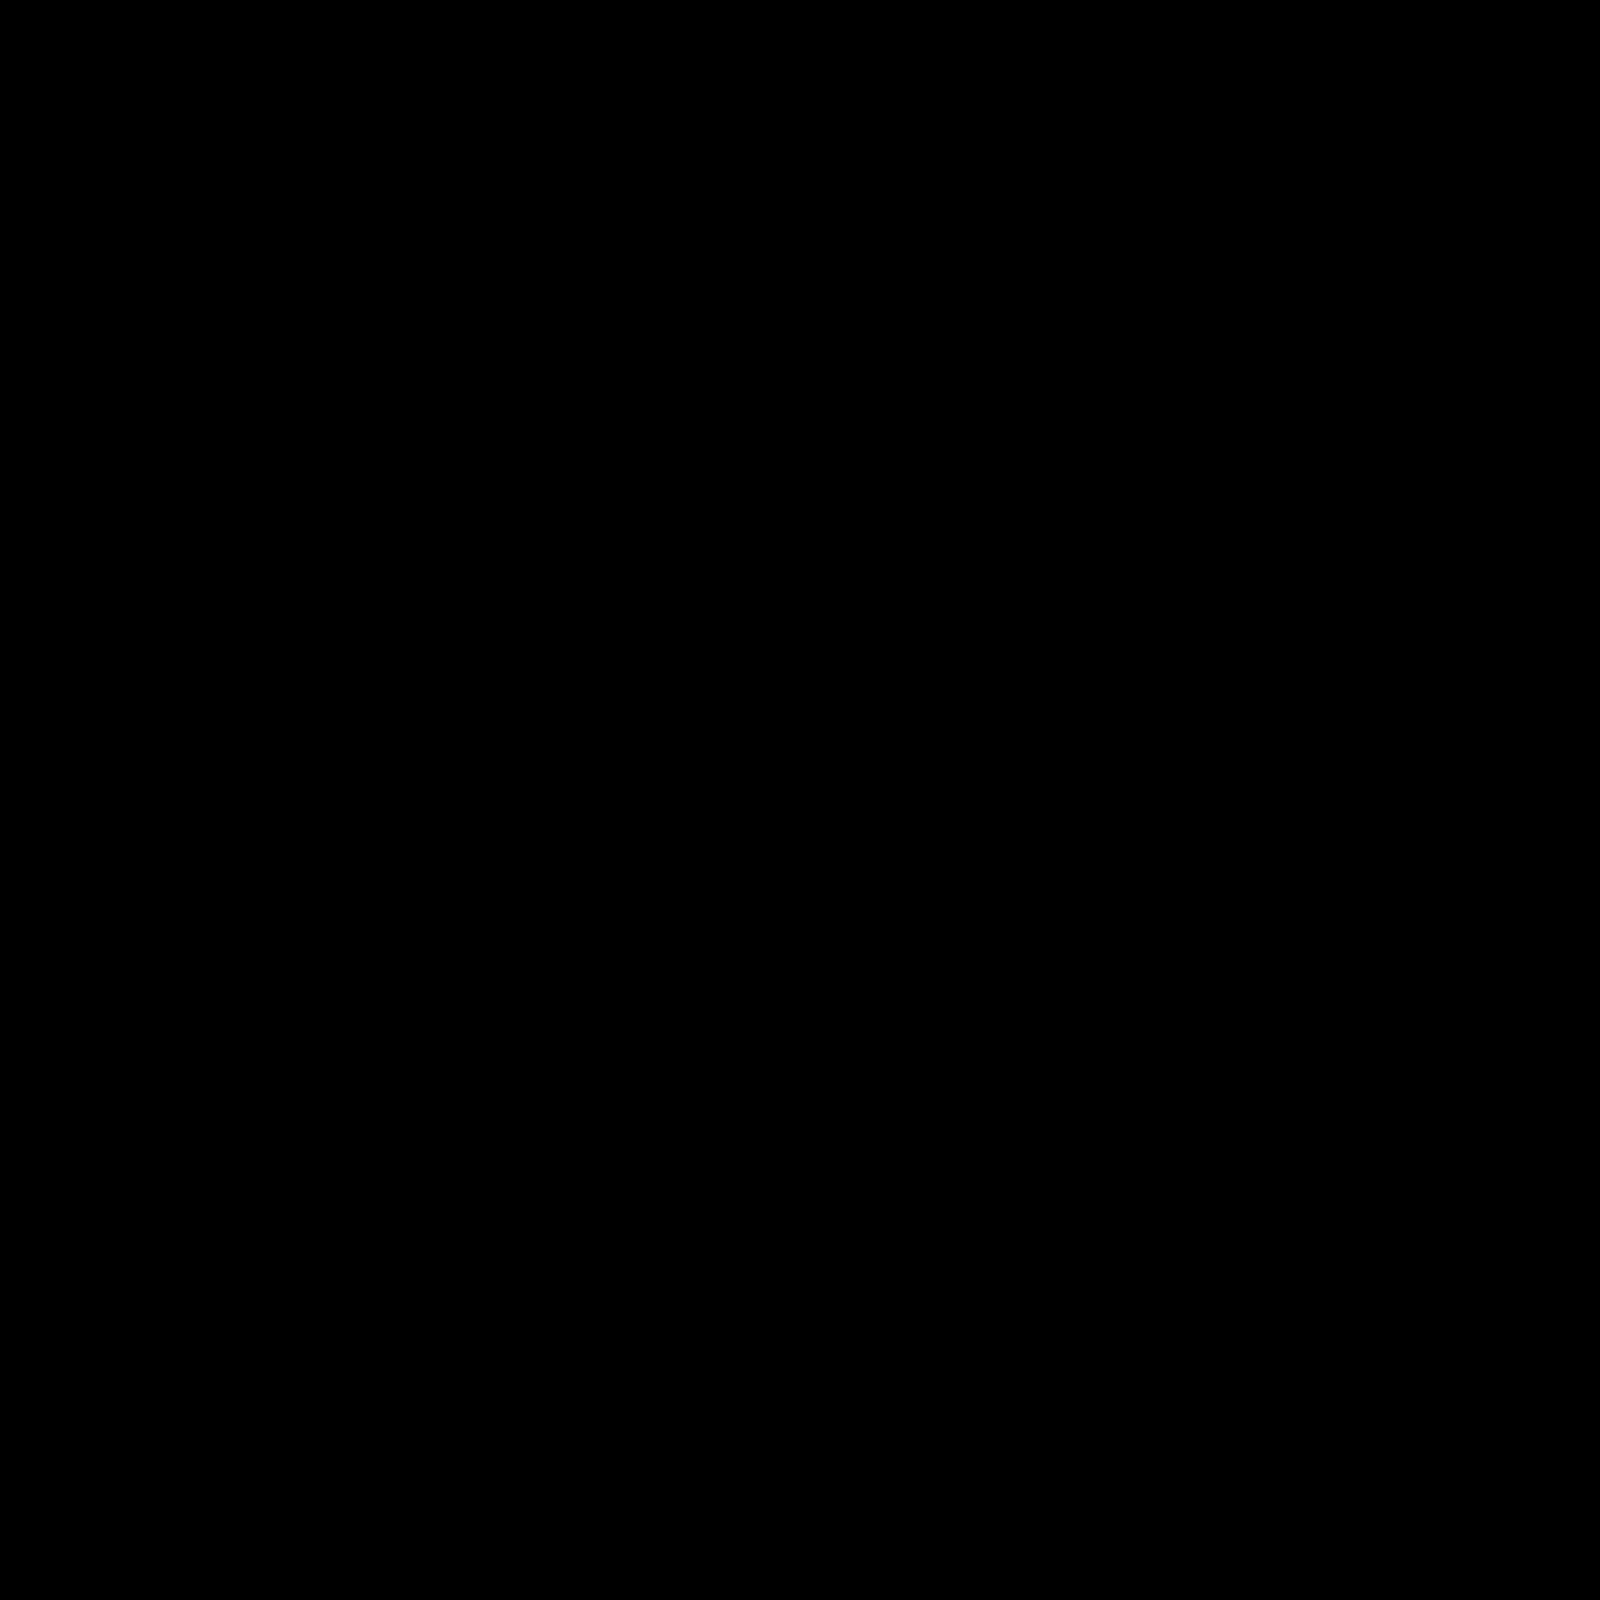 Single Choice icon